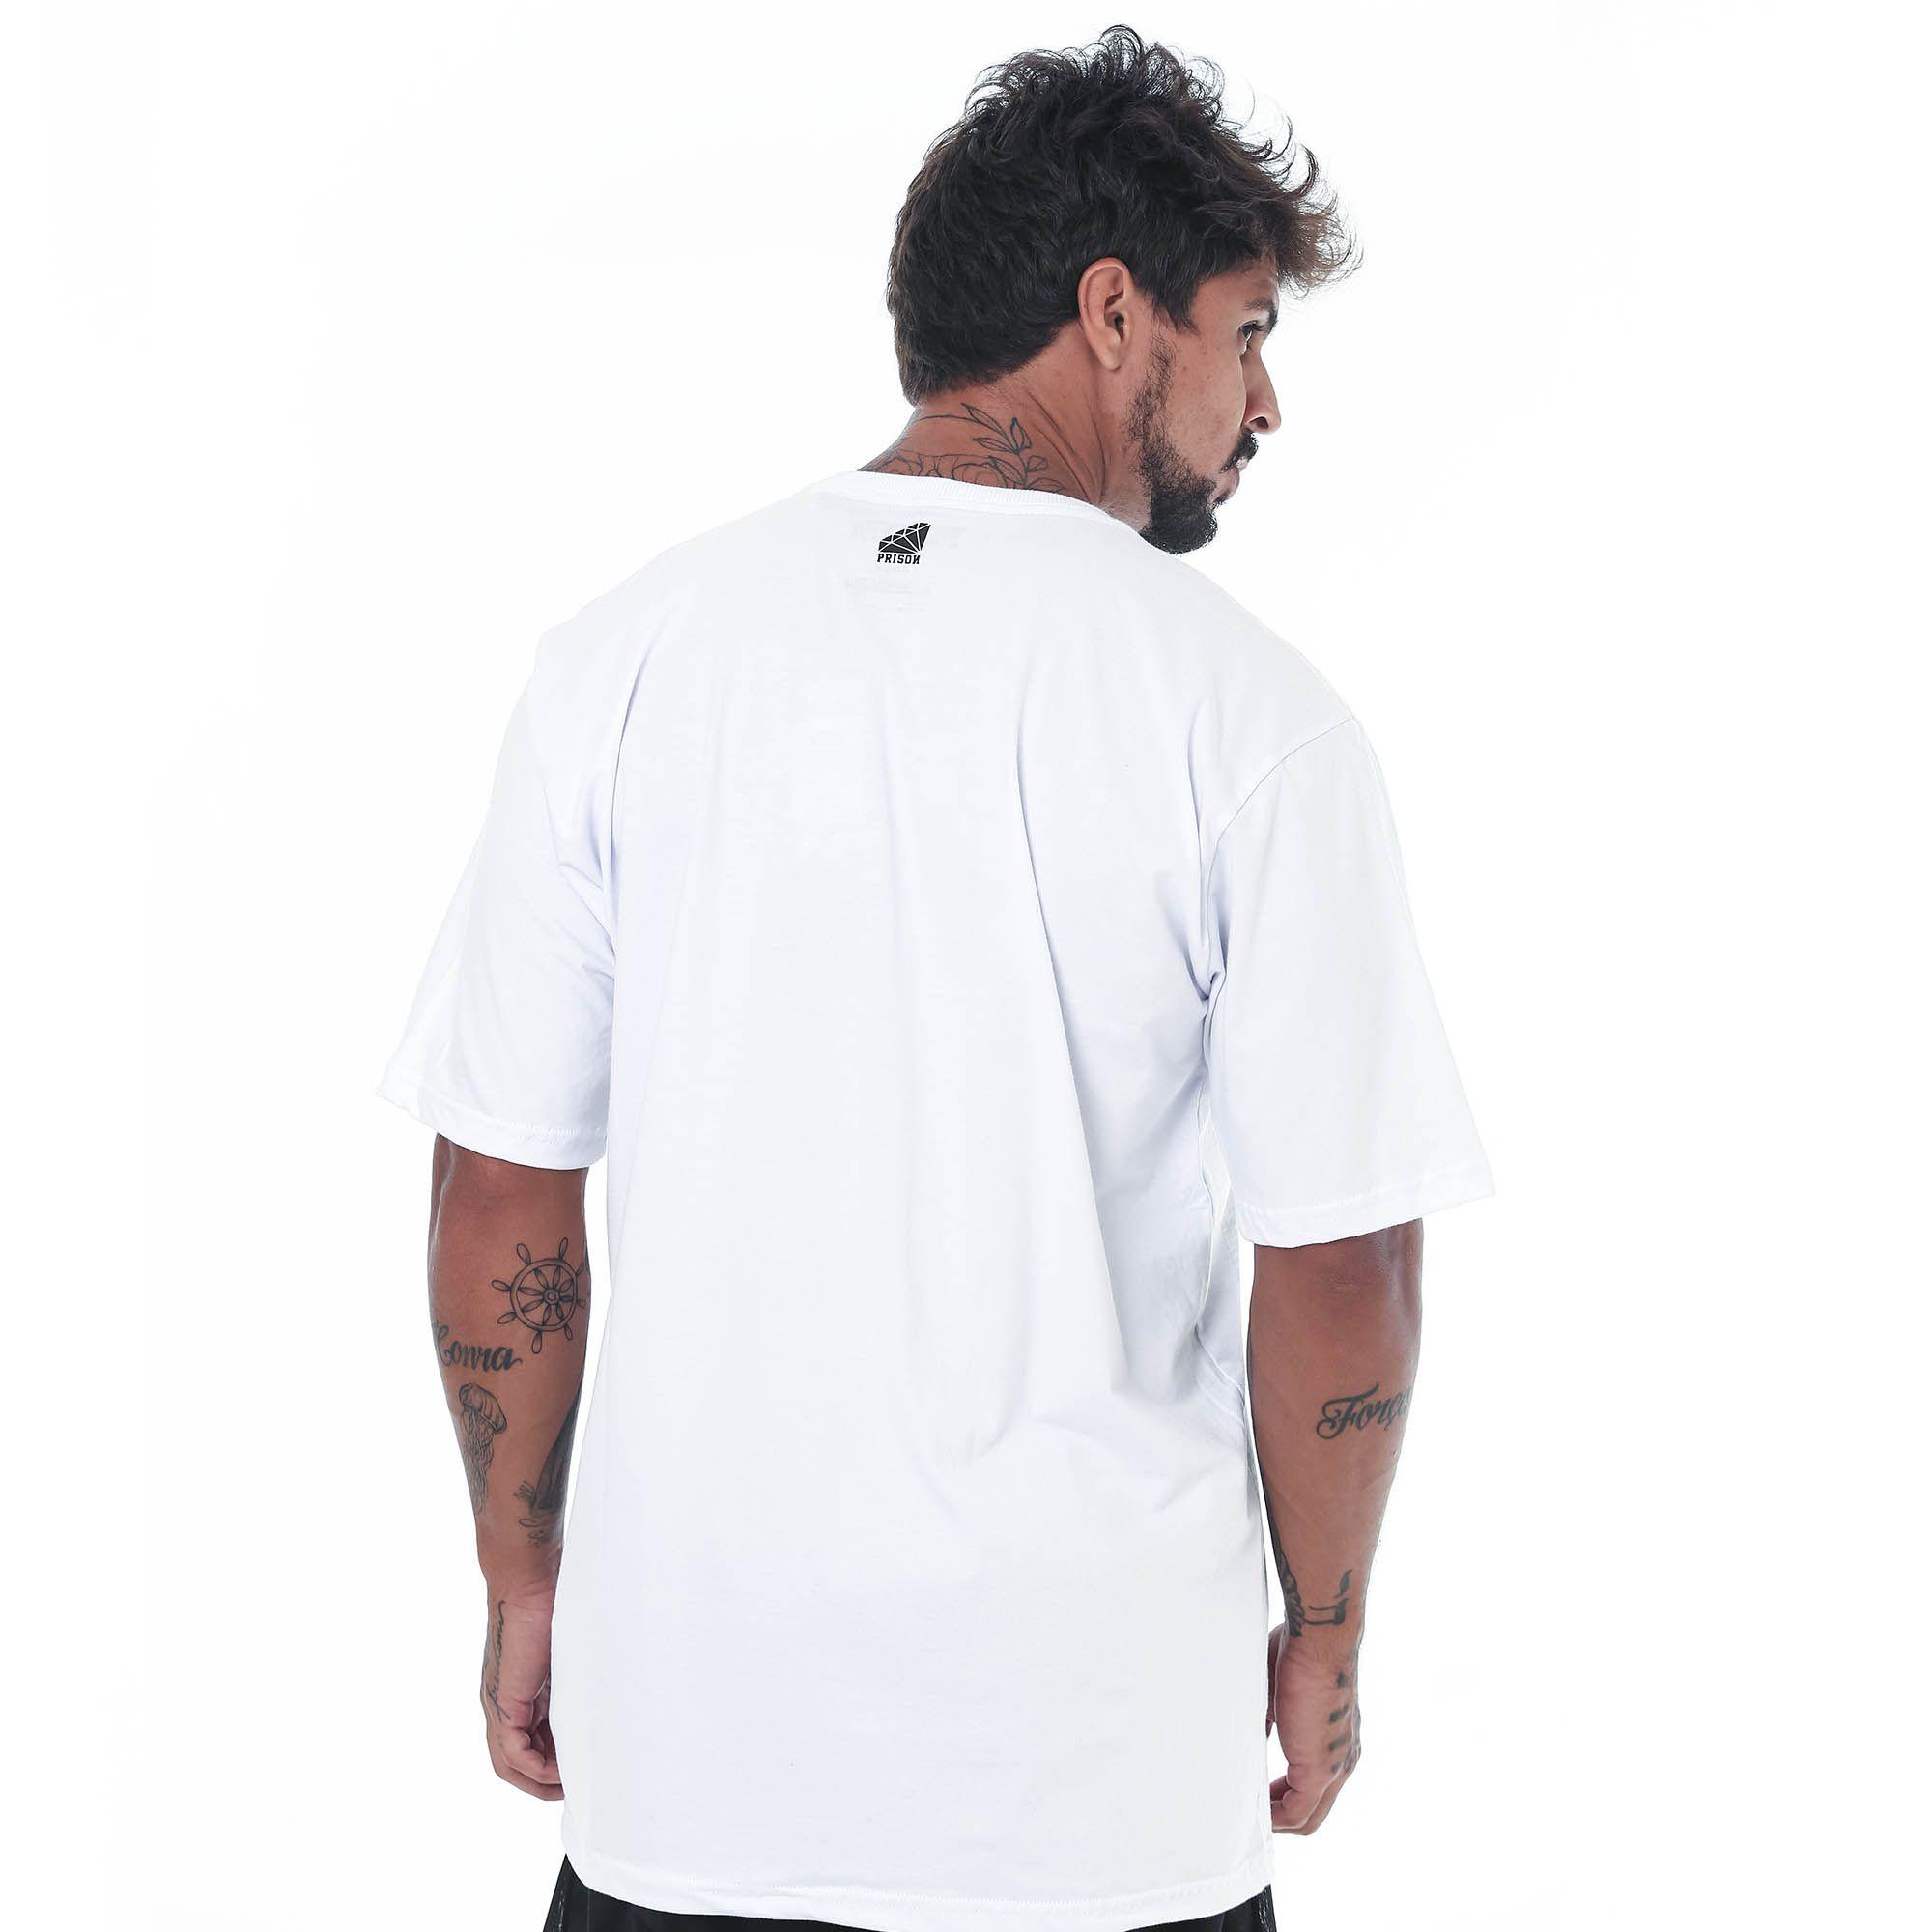 Camiseta Prison Japan Discreet Branca